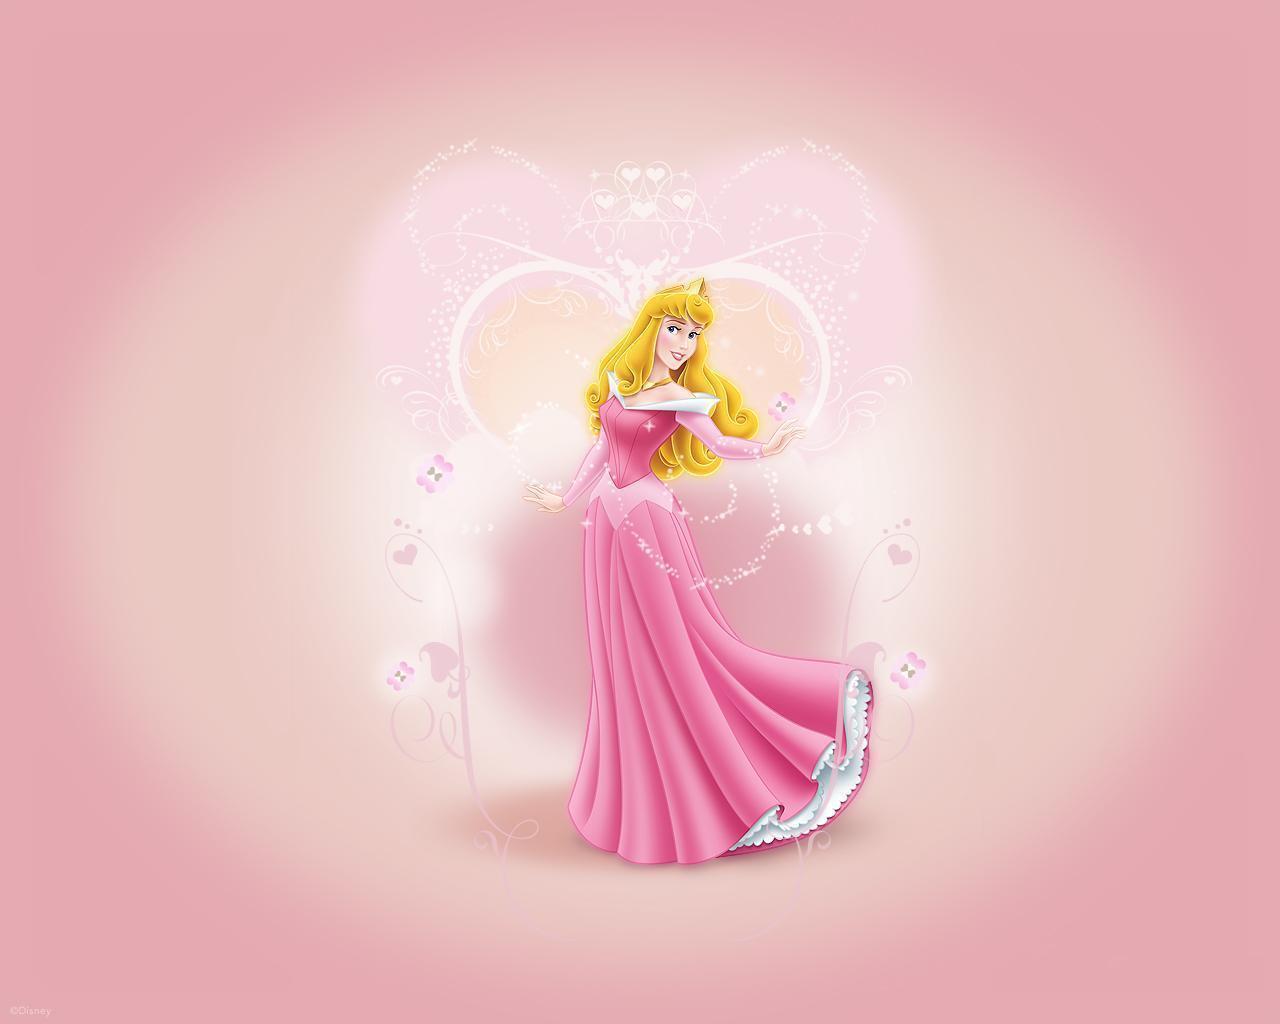 Sleeping Beauty - Sleeping Beauty Wallpaper (13785820 ...